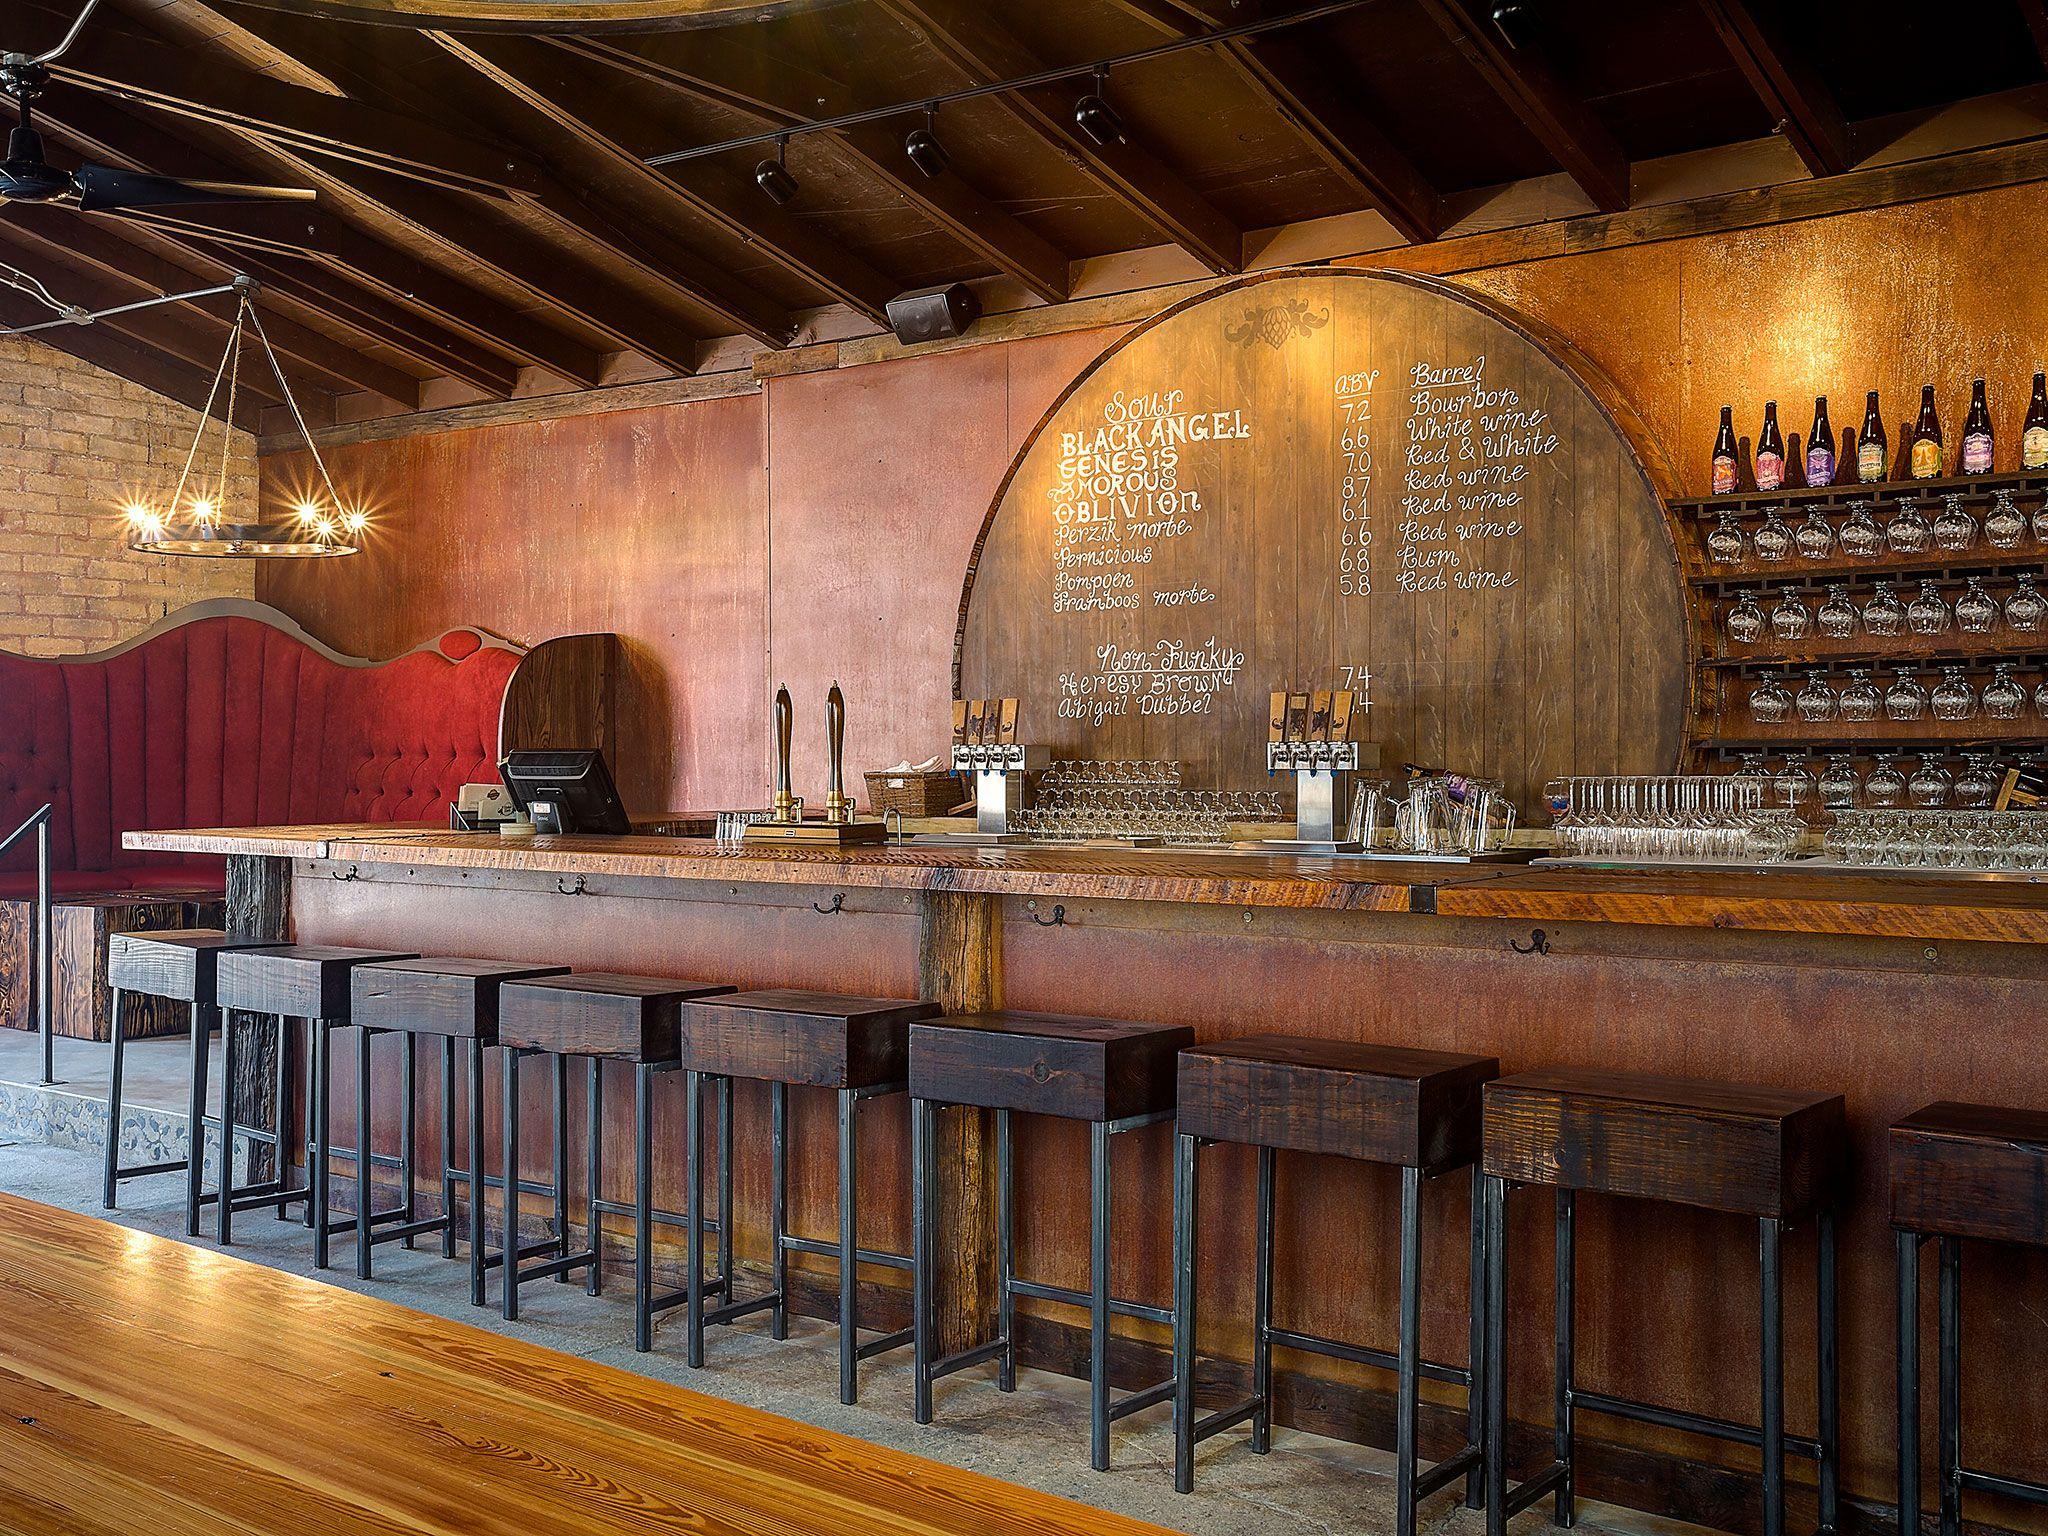 America's Best Beer Cities, As Chosen by Beer Experts - Condé Nast Traveler